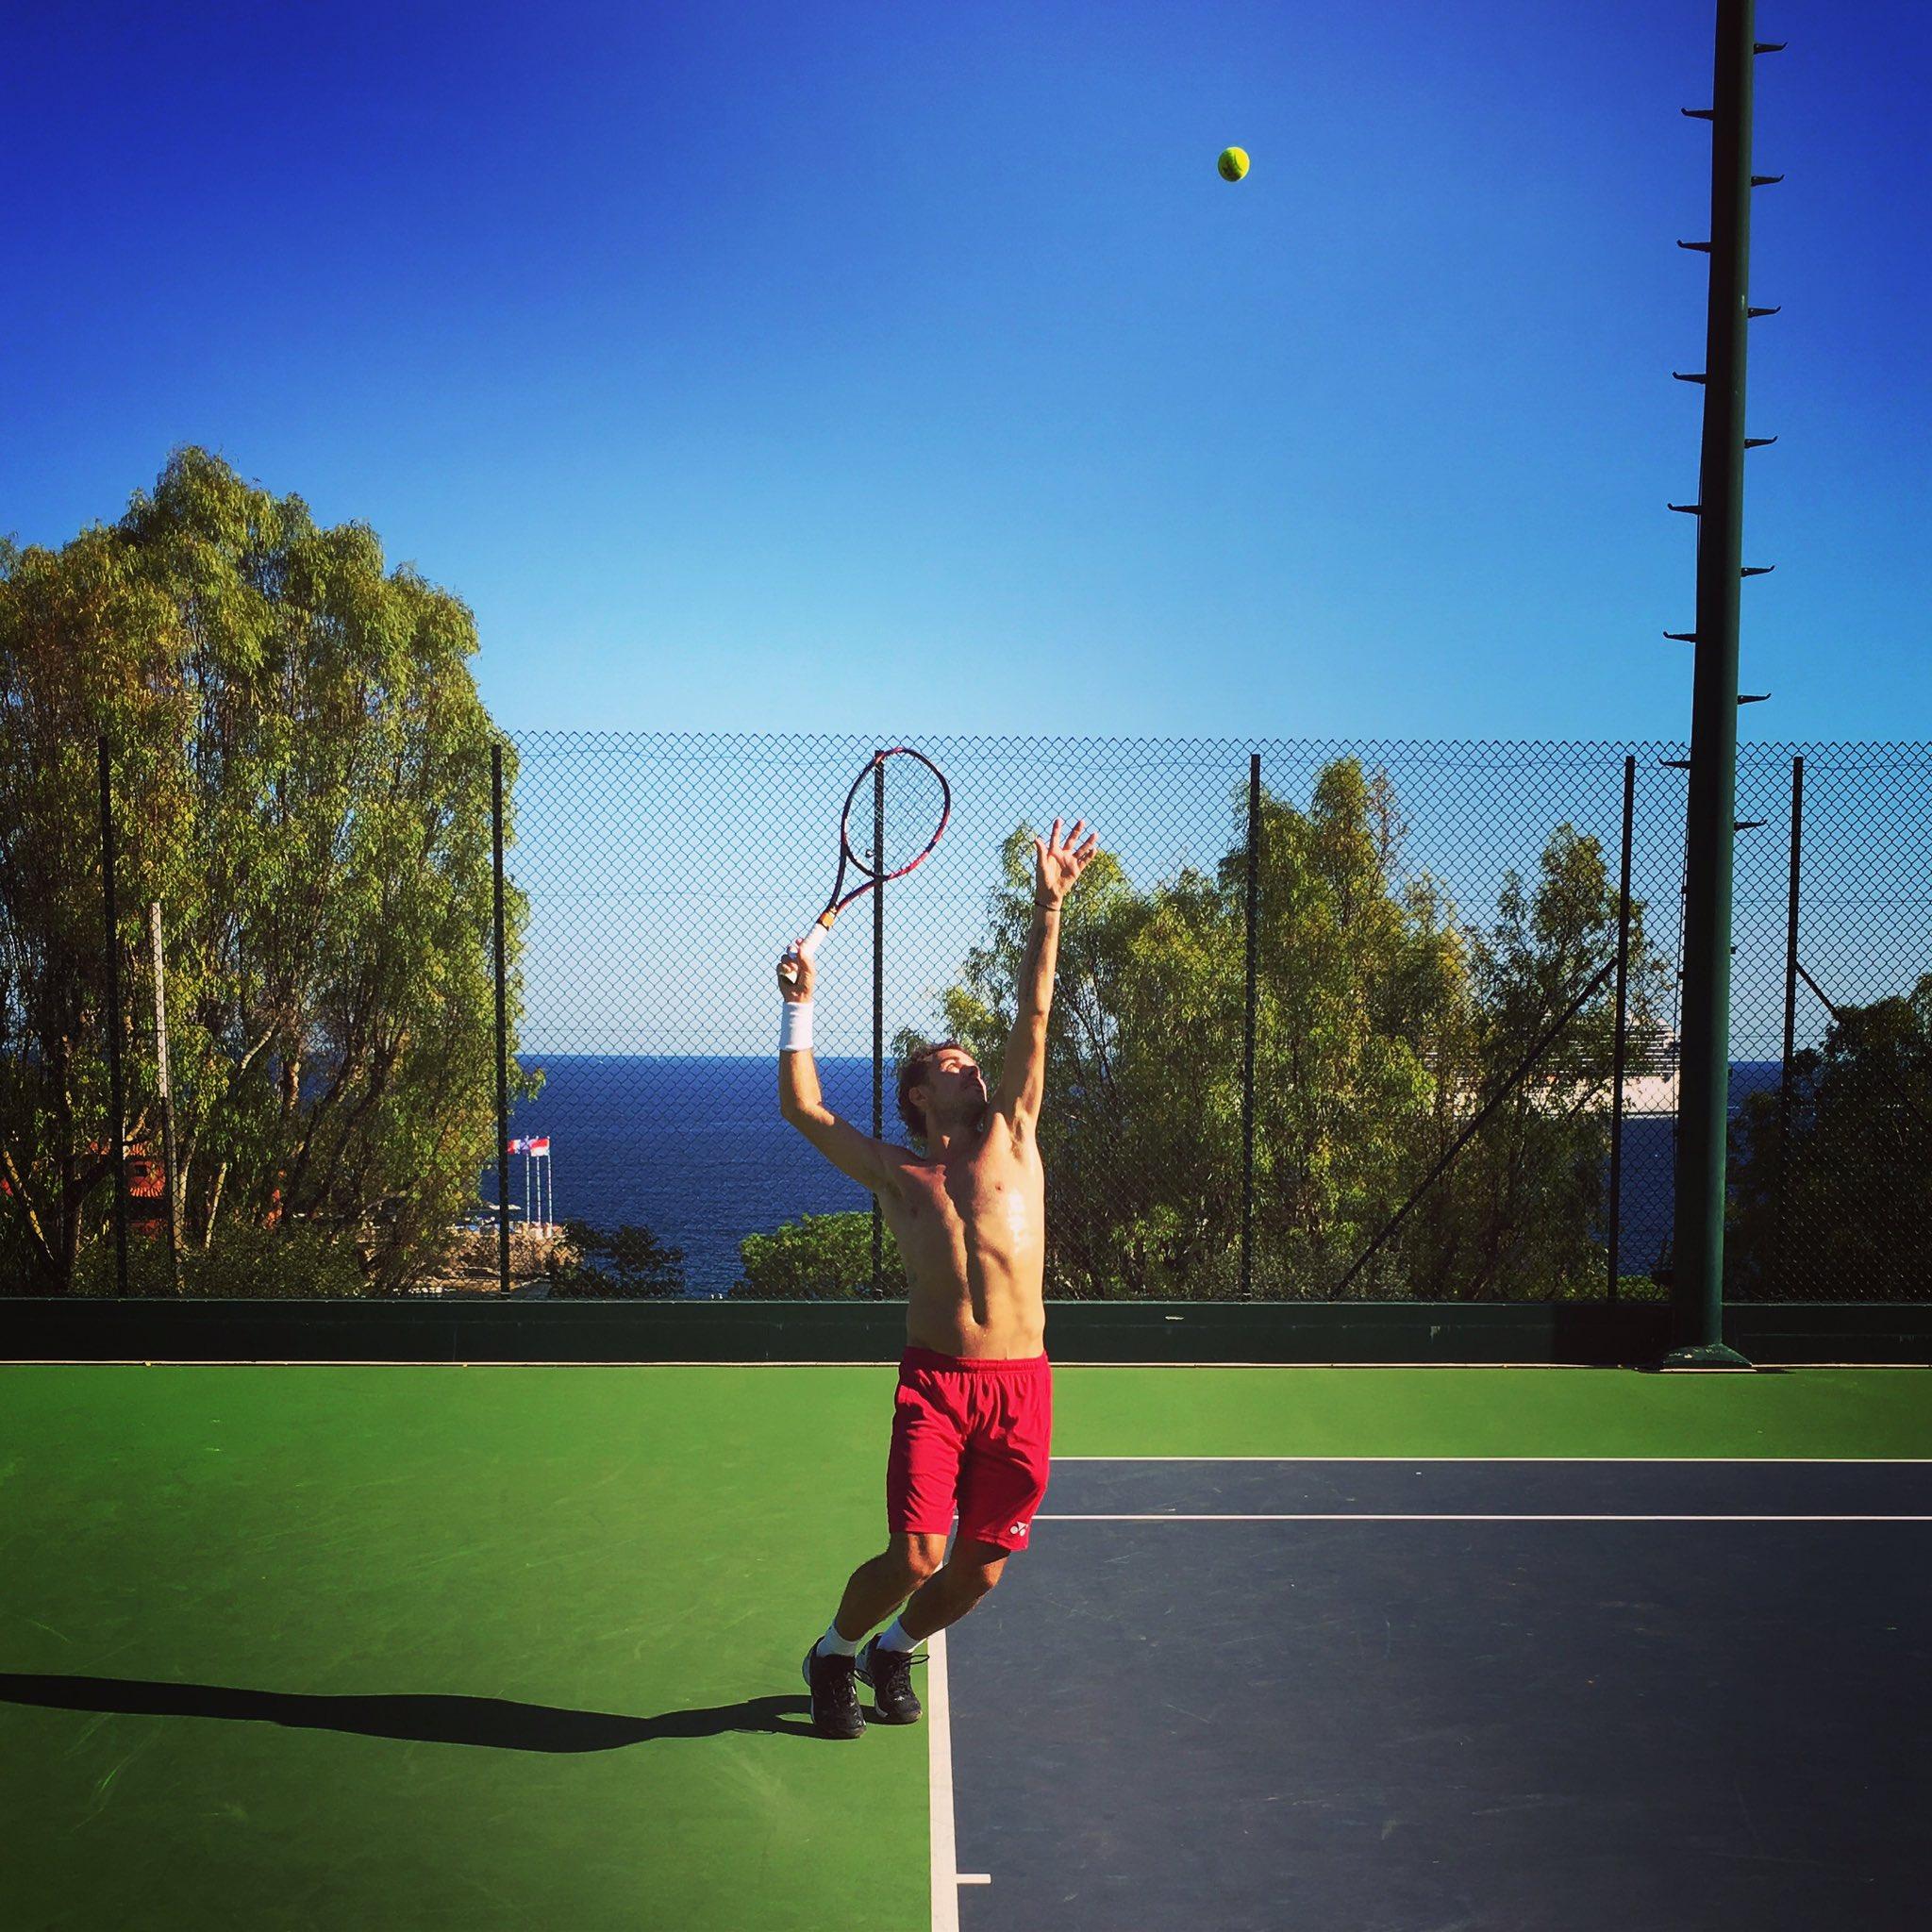 Getting back on the practice court !! ゚ムタ゚ᄂヤ¬ワプマᄏᄌマ゚メᆭ゚ムプマᄏ゚メᆰ゚マᄏ゚リポマテ゚マᄏ゚マピマᄏ゚ホᄒ¬リタᄌマ゚ヤᆬ゚メᆬ゚モᄌ゚ヤン゚ミᄏ゚リリ゚ミᄐ!! https://t.co/VrqDvIQfxn